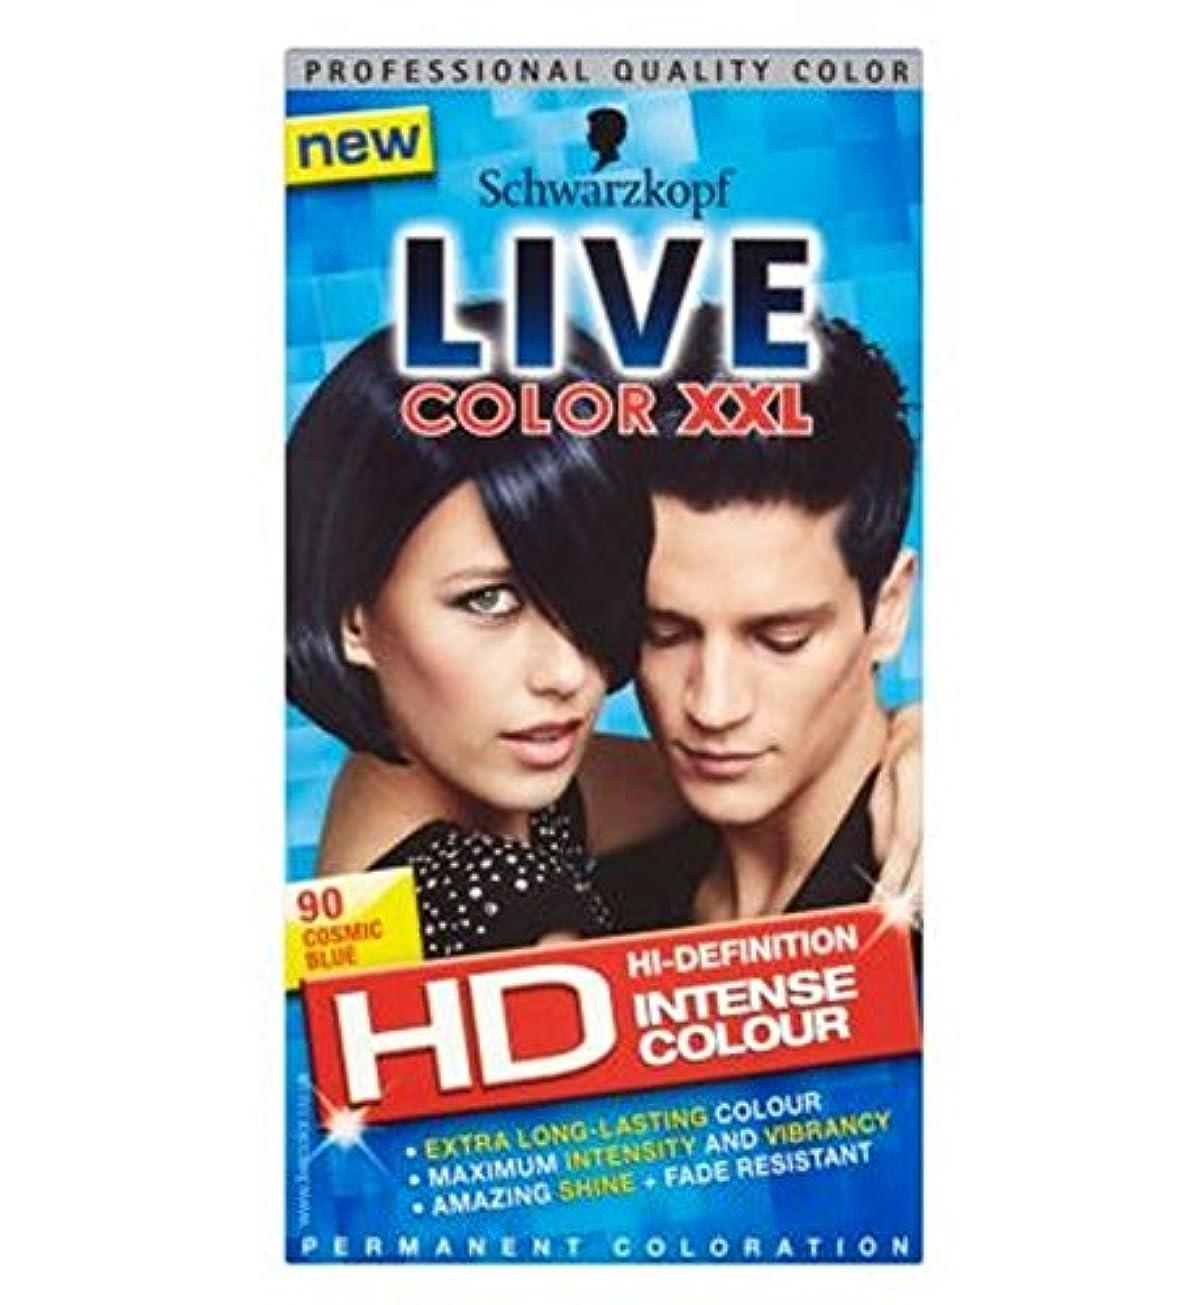 Schwarzkopf LIVE Color XXL HD 90 Cosmic Blue Permanent Blue Hair Dye - シュワルツコフライブカラーXxl Hd 90宇宙の青い永久青い髪の染料 (Schwarzkopf...